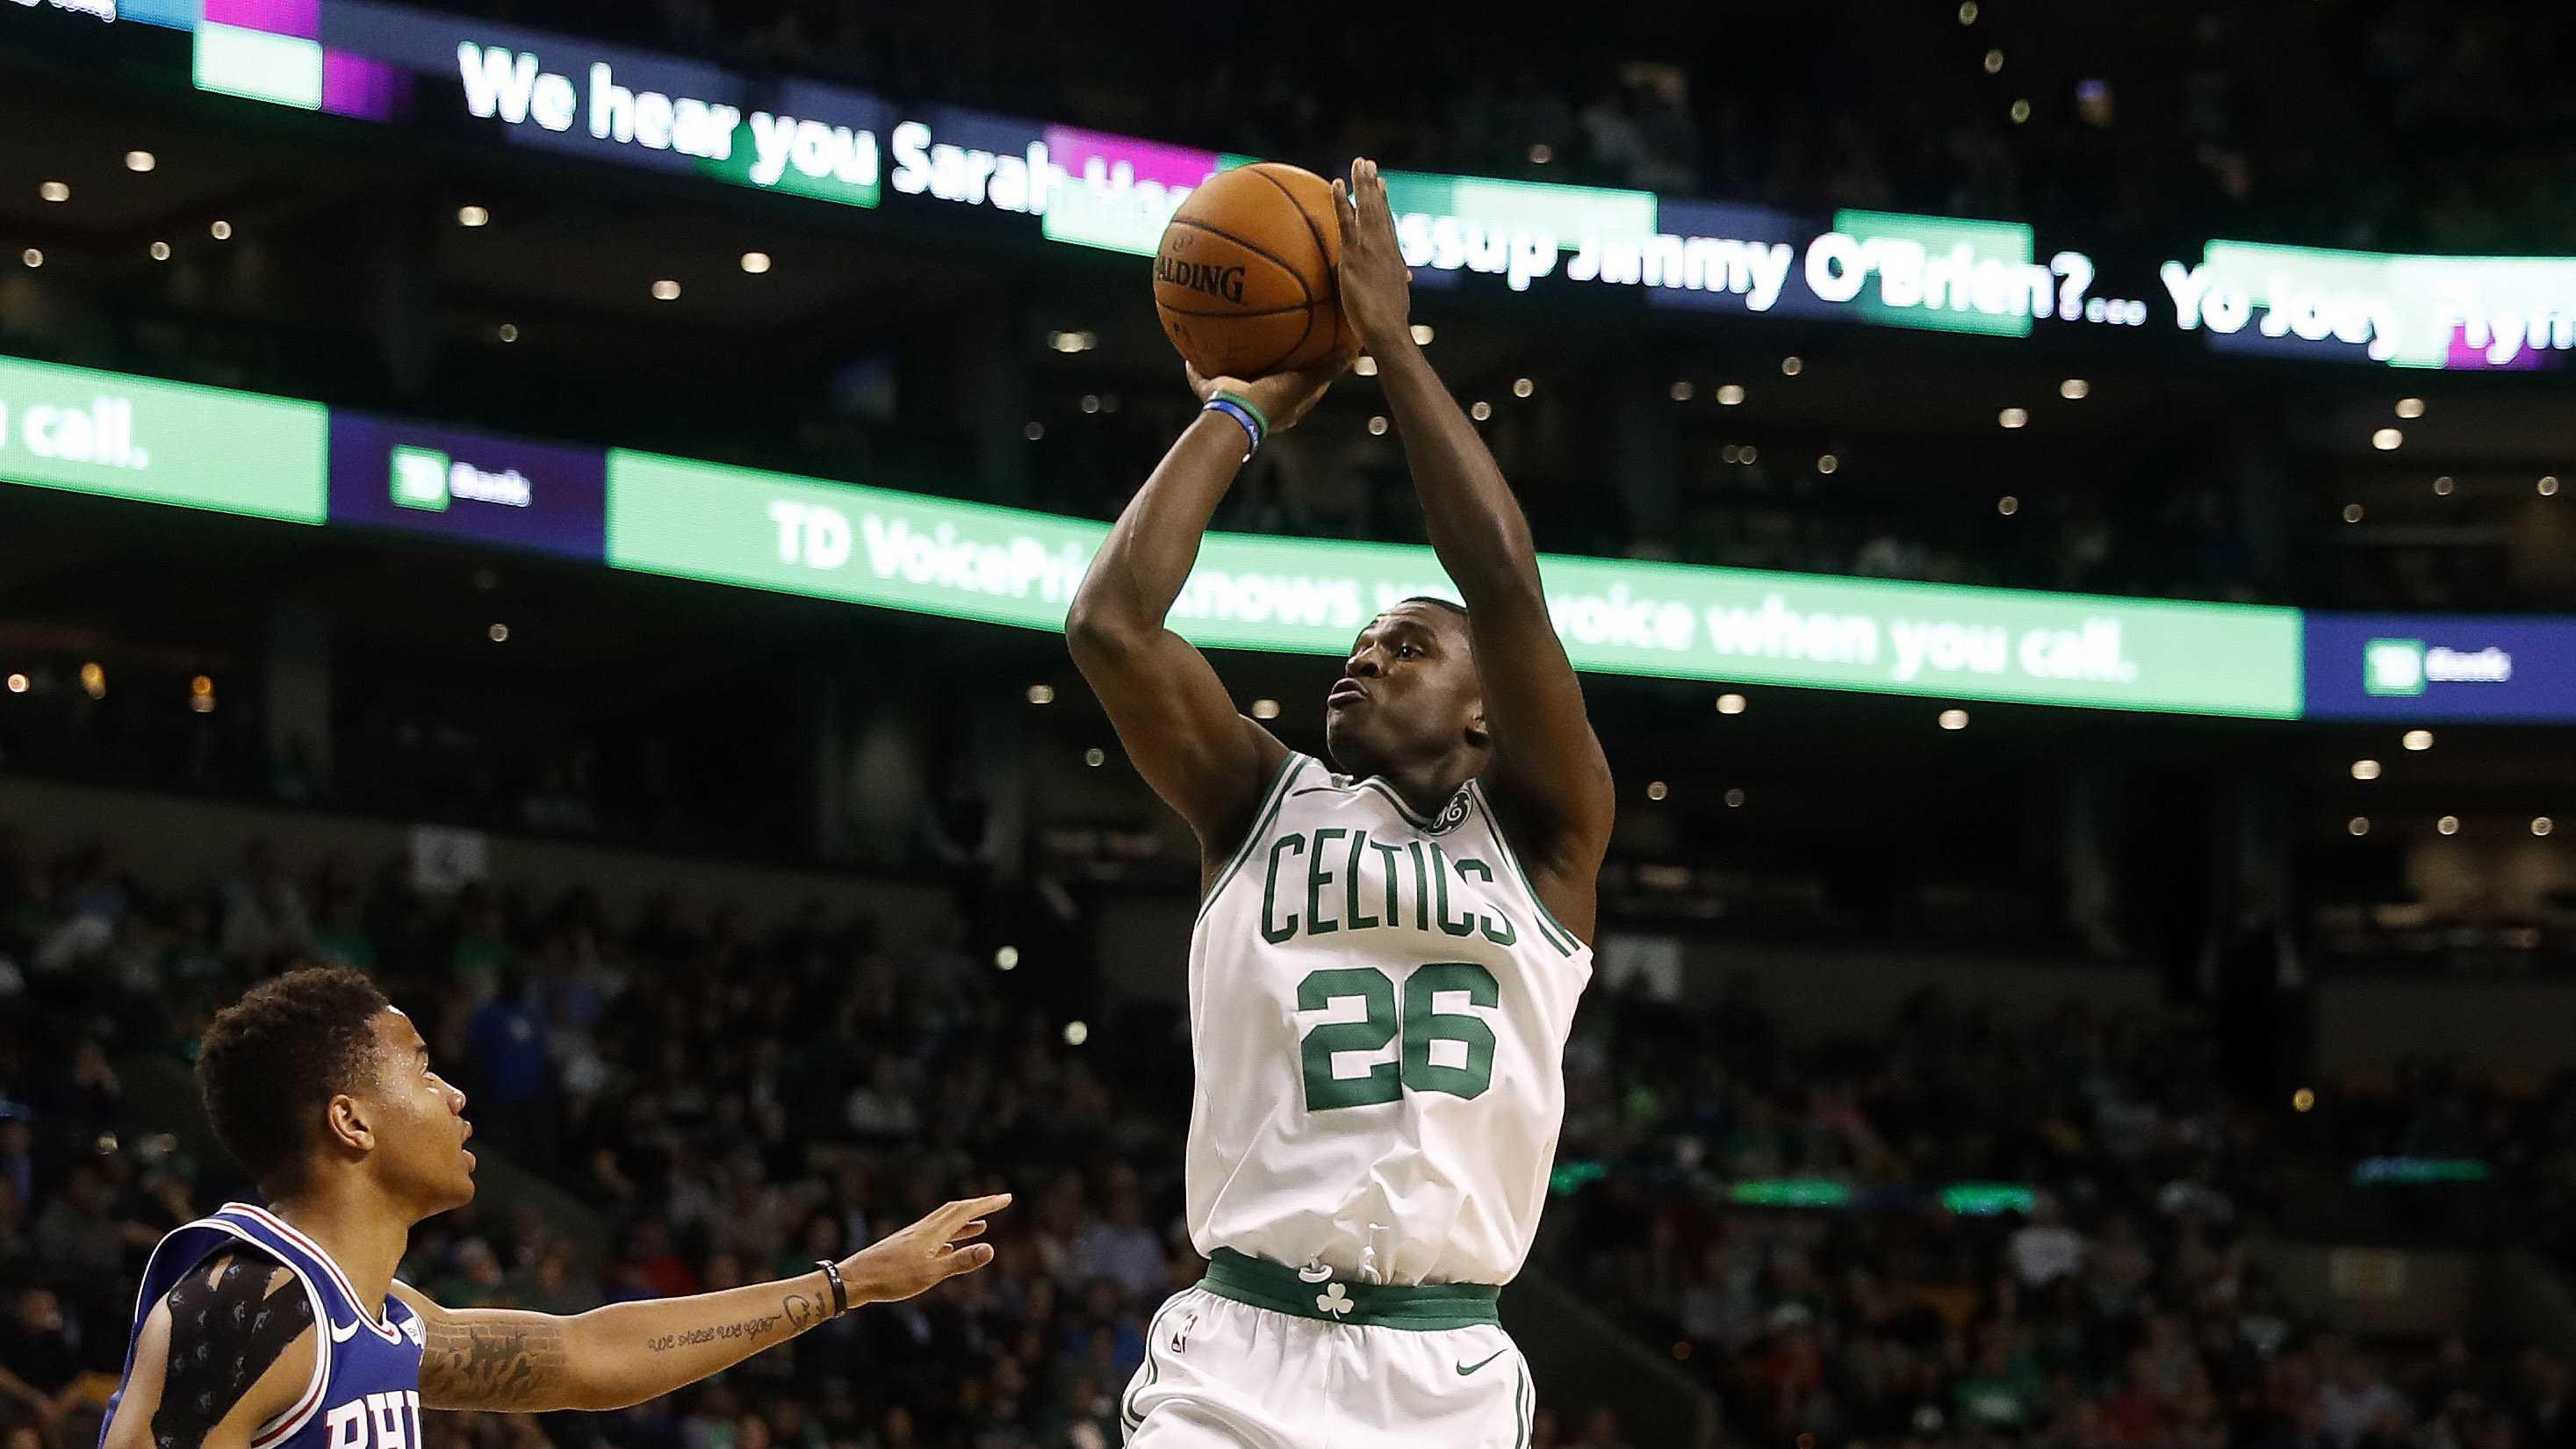 Boston Celtics guard Jabari Bird shoots during the second half of Boston's 113-96 win over the Philadelphia 76ers in a preseason NBA basketball game in Boston Monday, Oct. 9, 2017. (AP Photo/Winslow Townson)